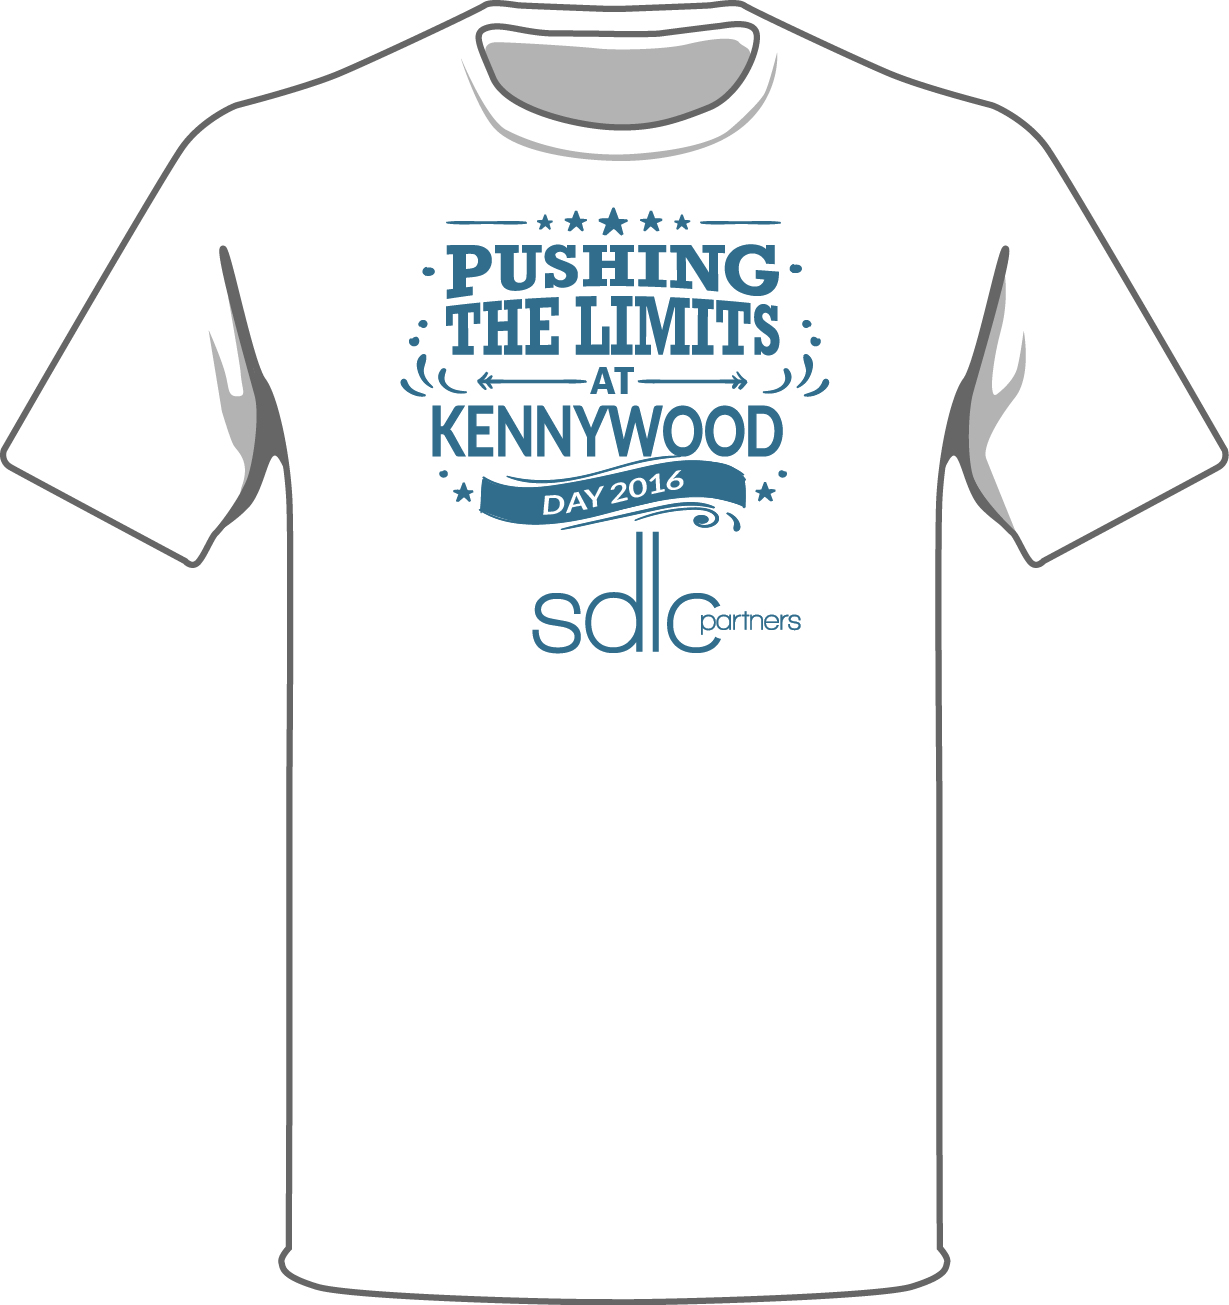 SDLC 2016 kennywood t-shirt